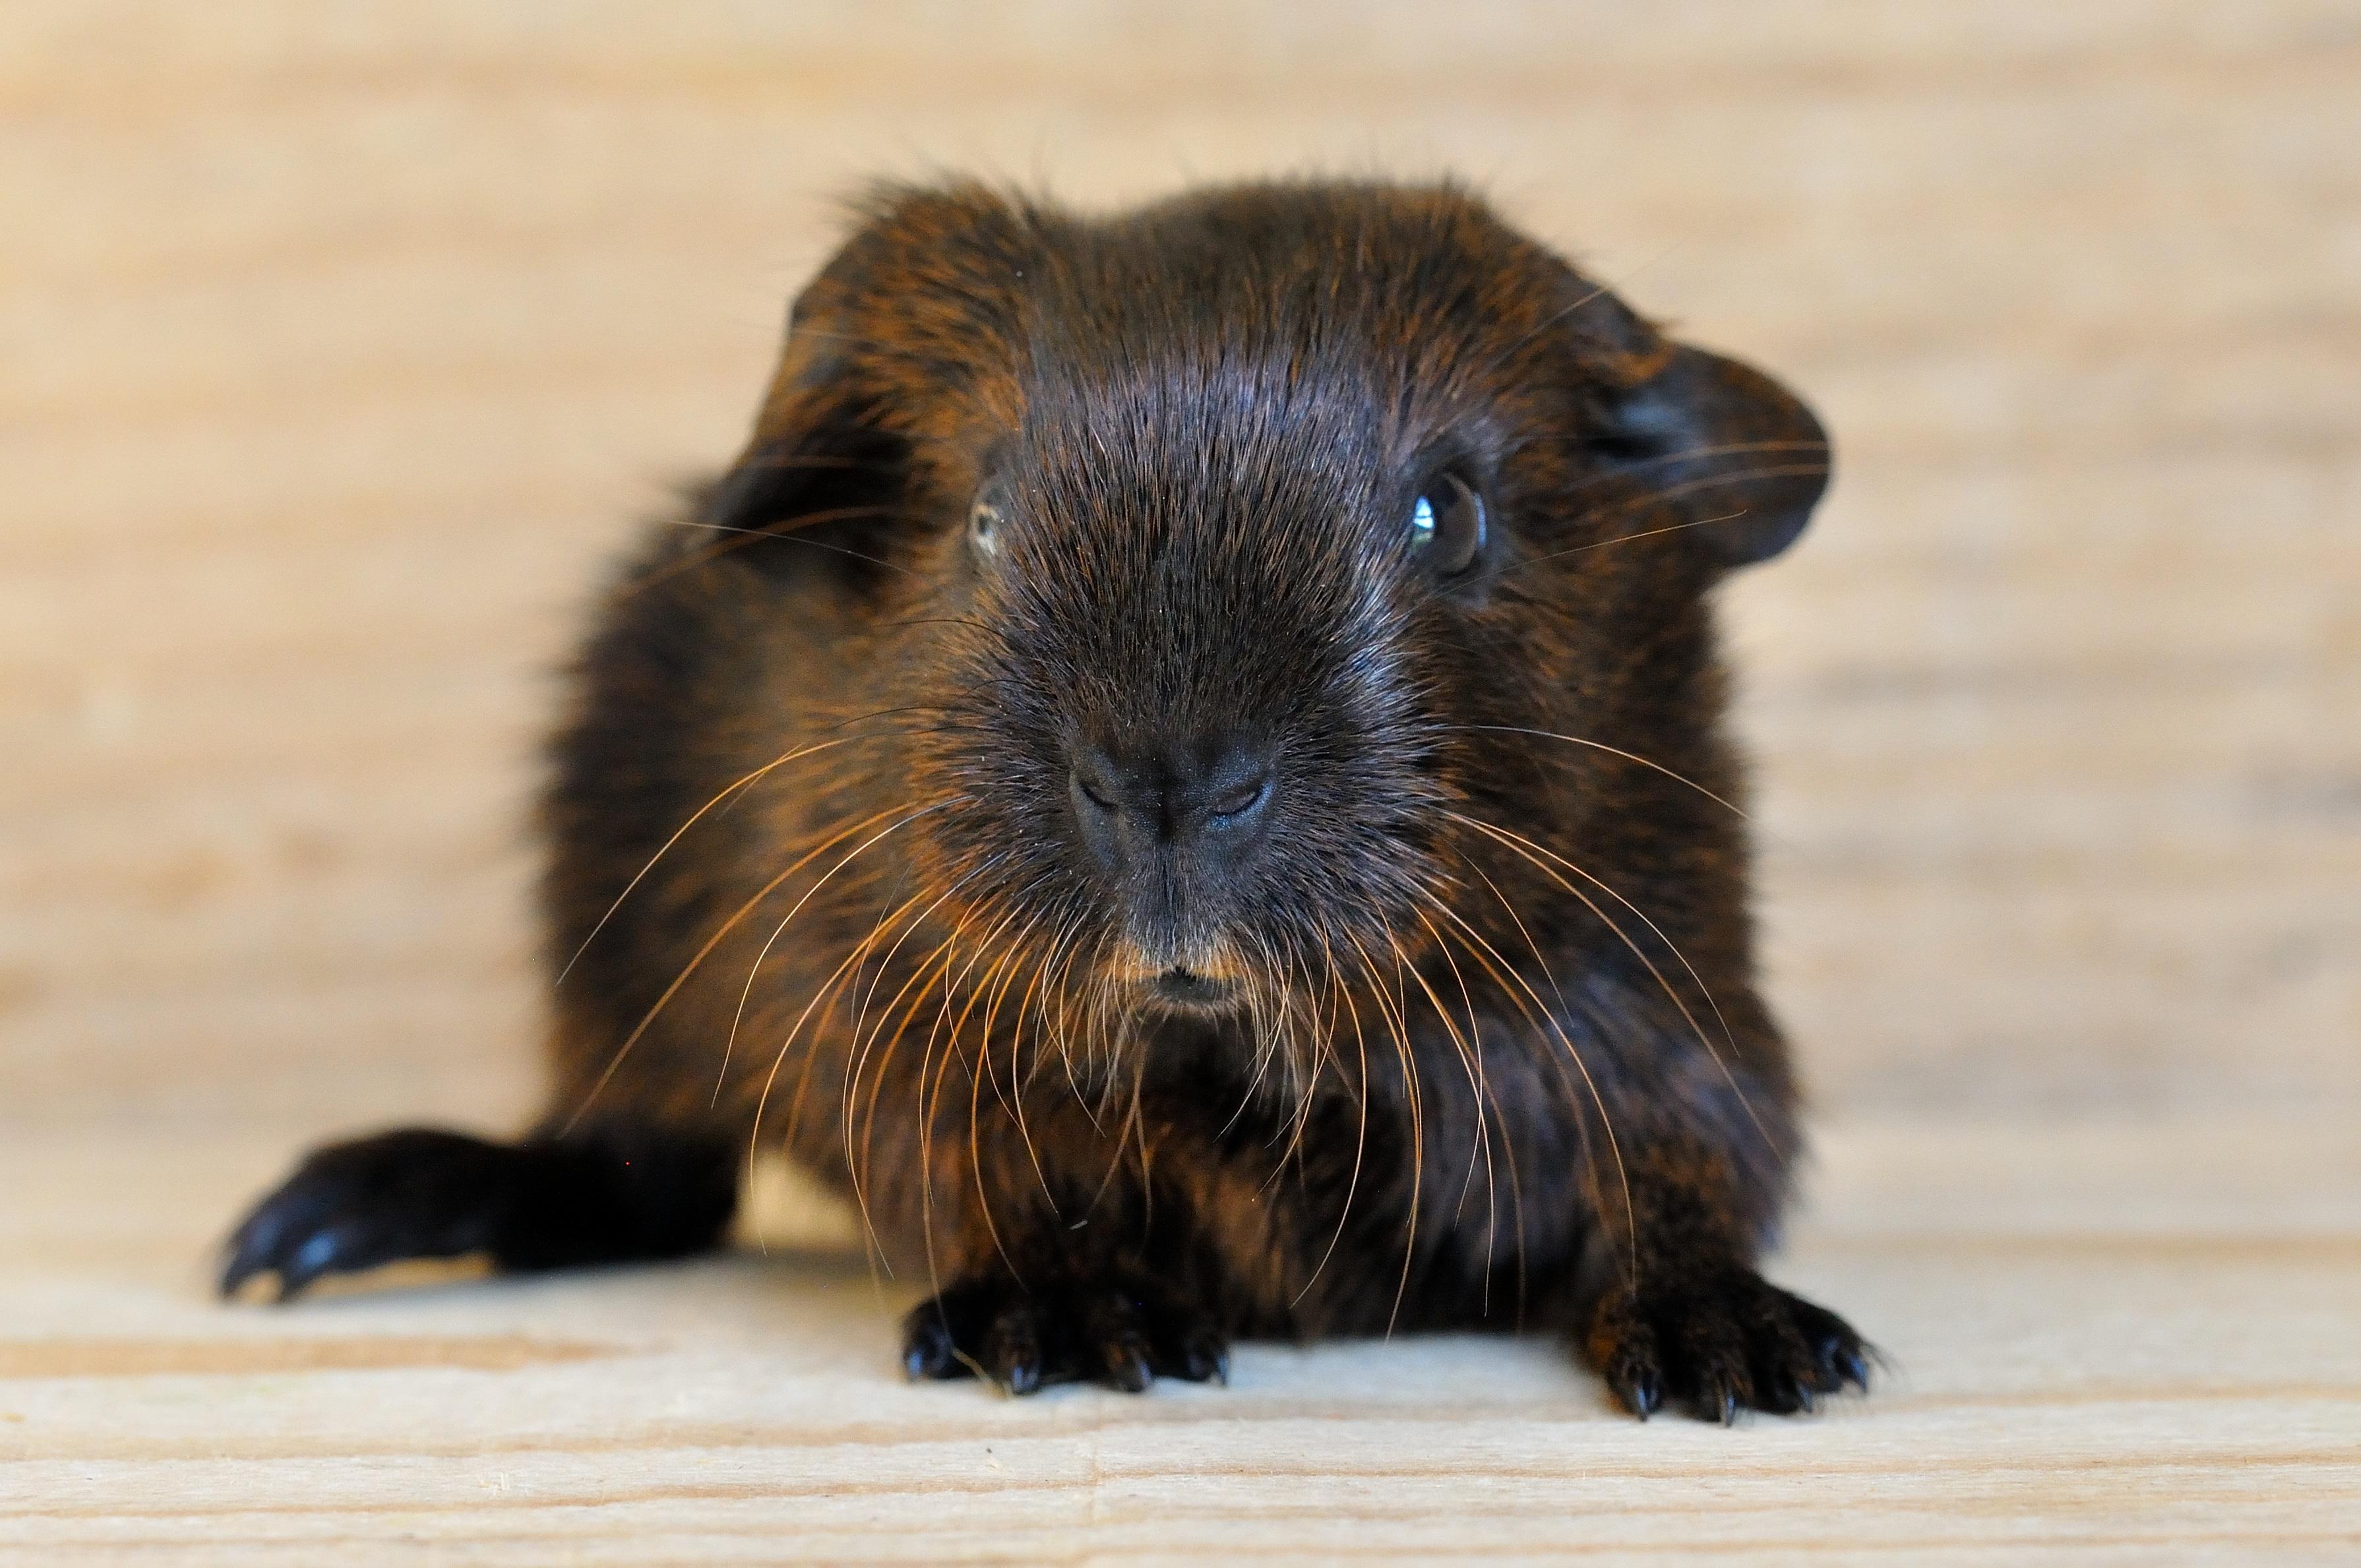 Guinea Pig, Adorable, Animal, Cute, Friend, HQ Photo